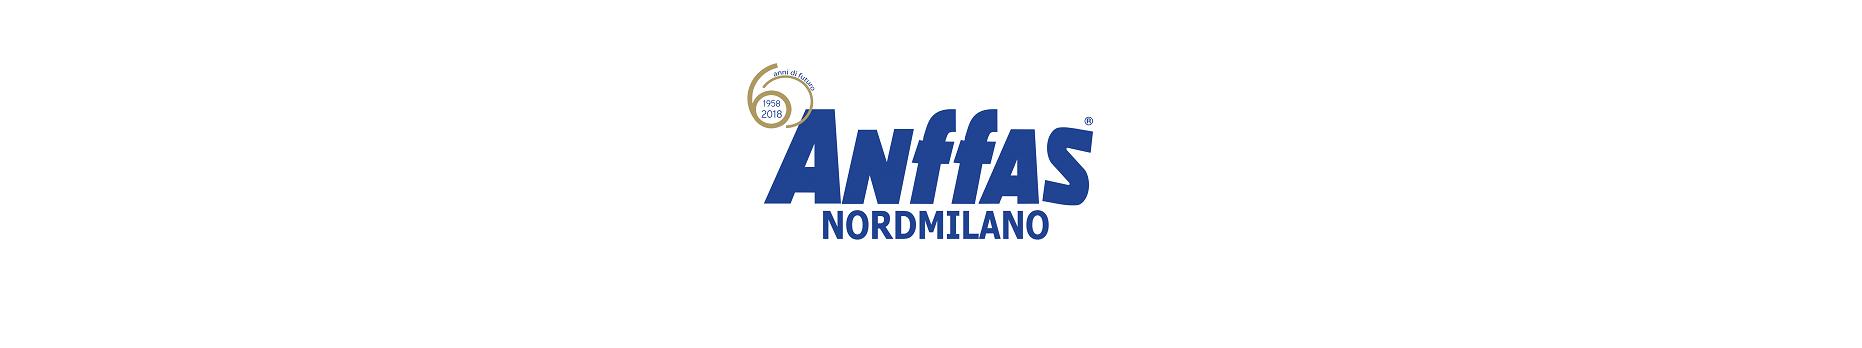 Associazione Anfass logo